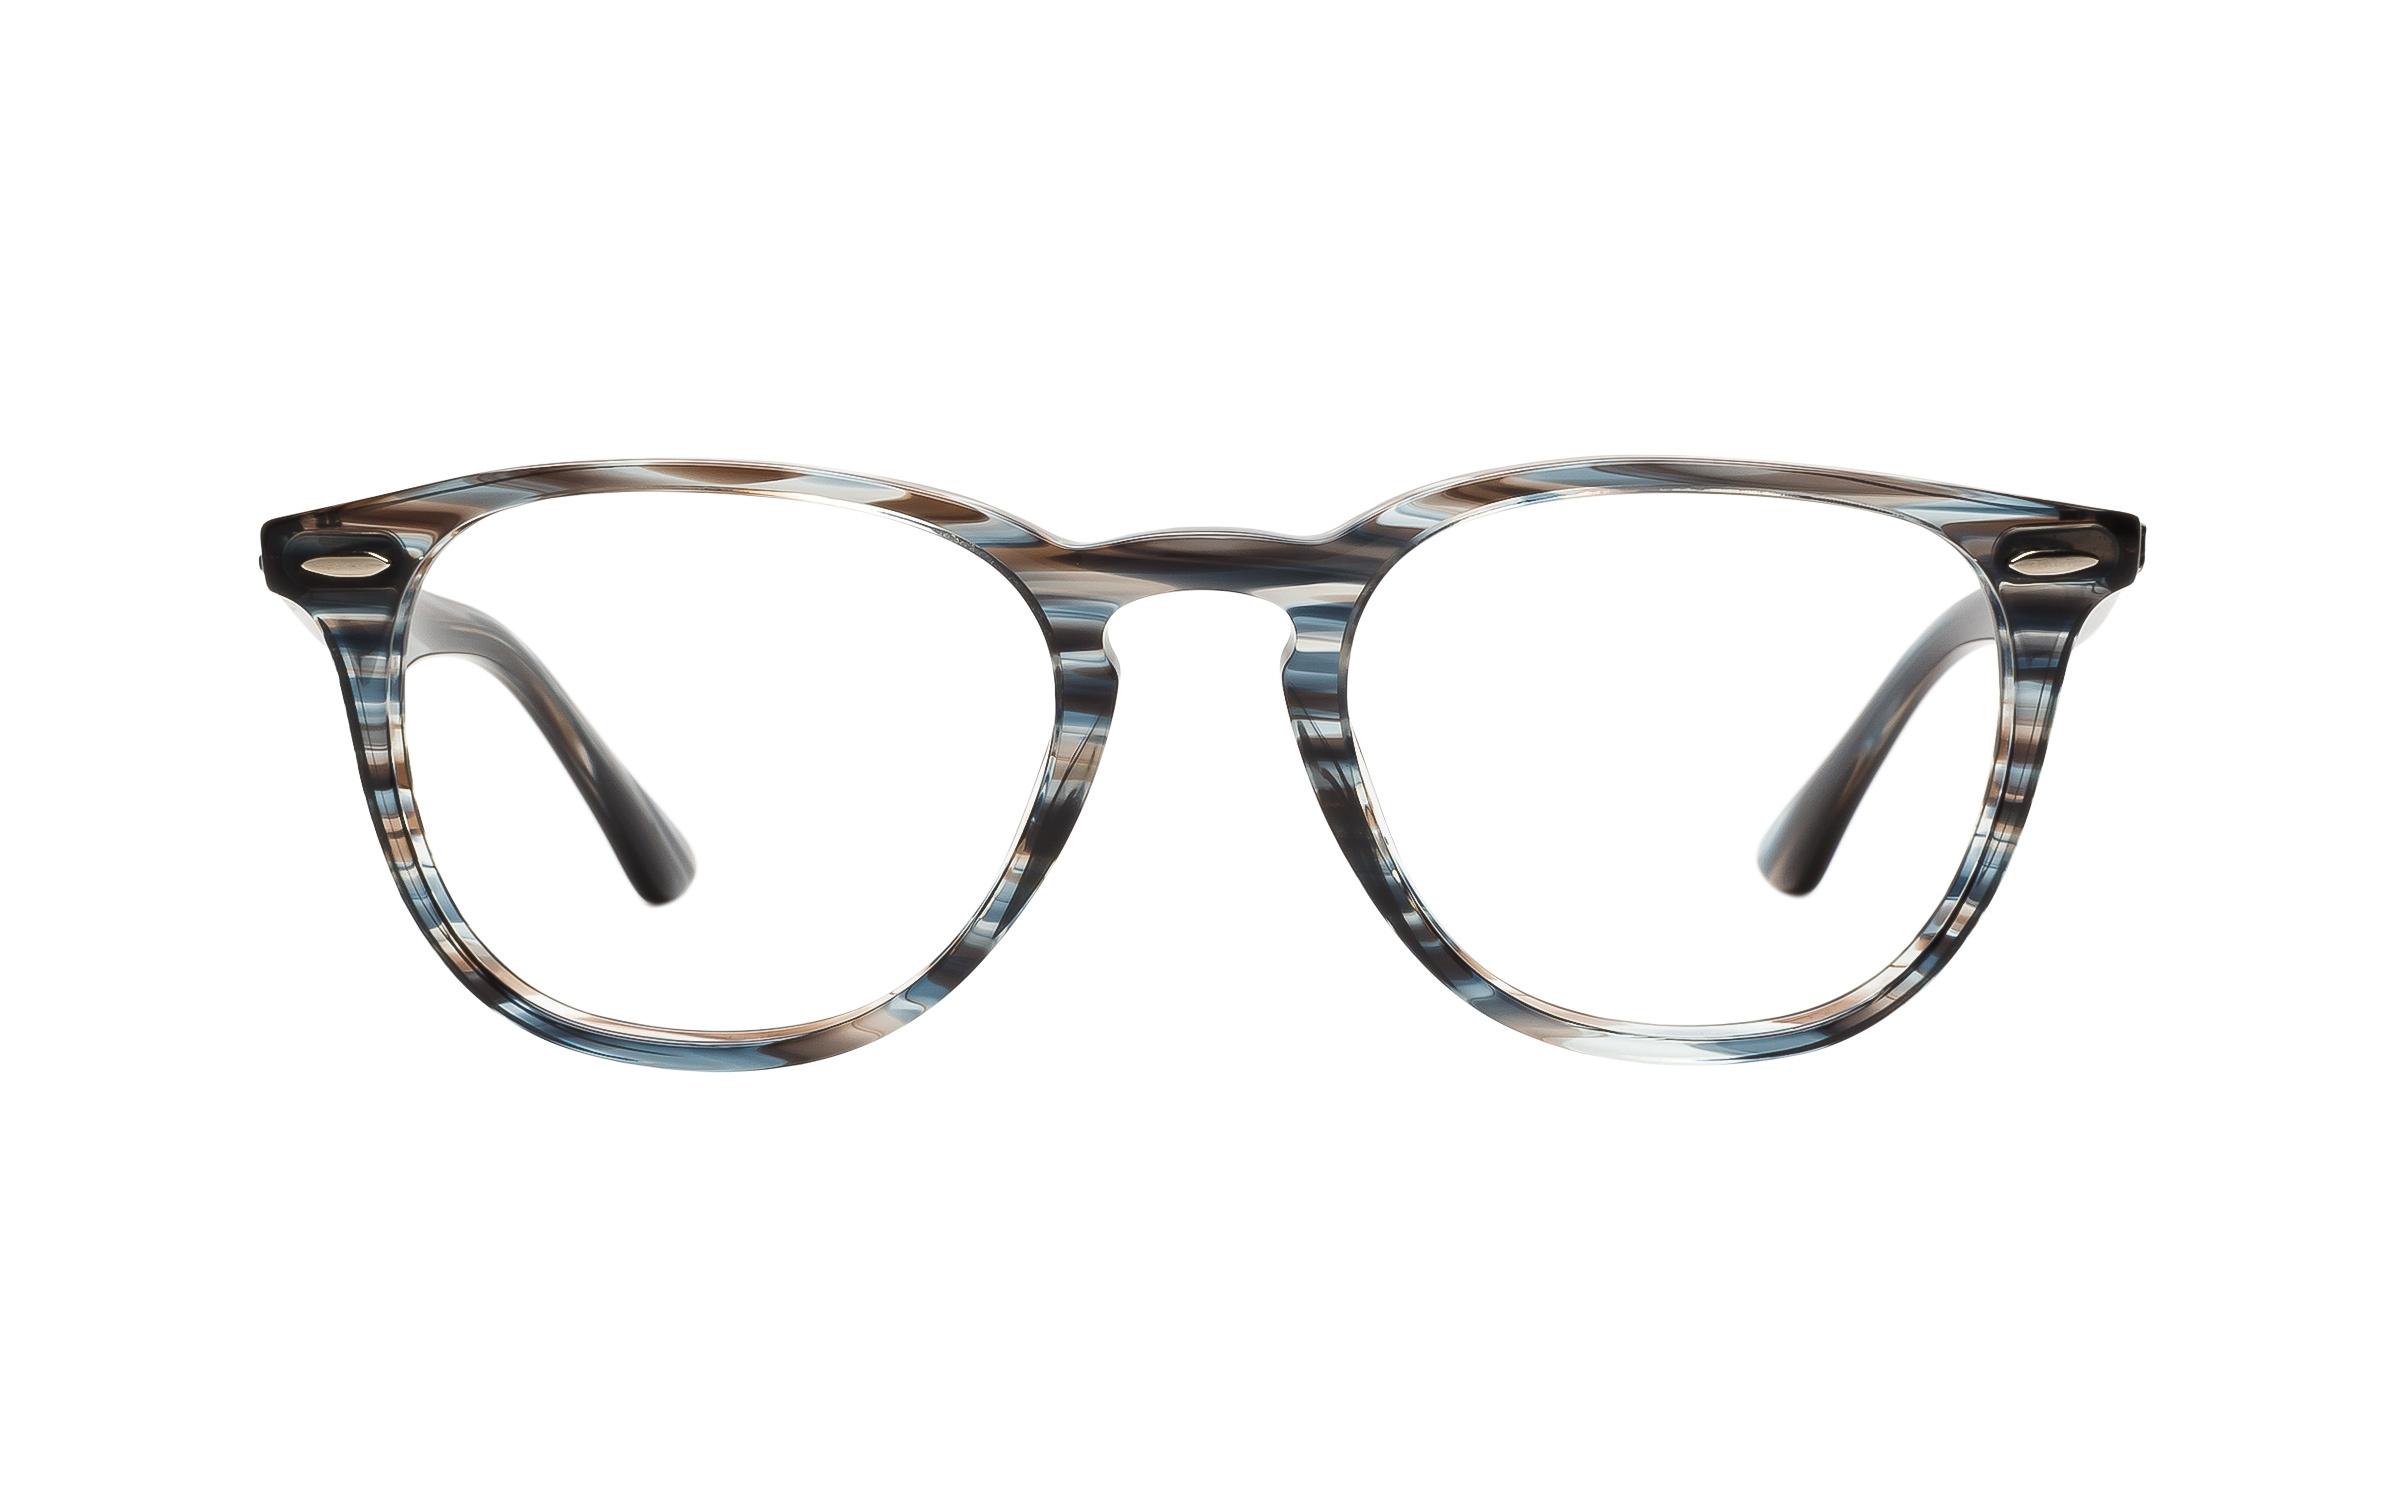 Ray-Ban Glasses Vintage Blue Acetate Online Coastal